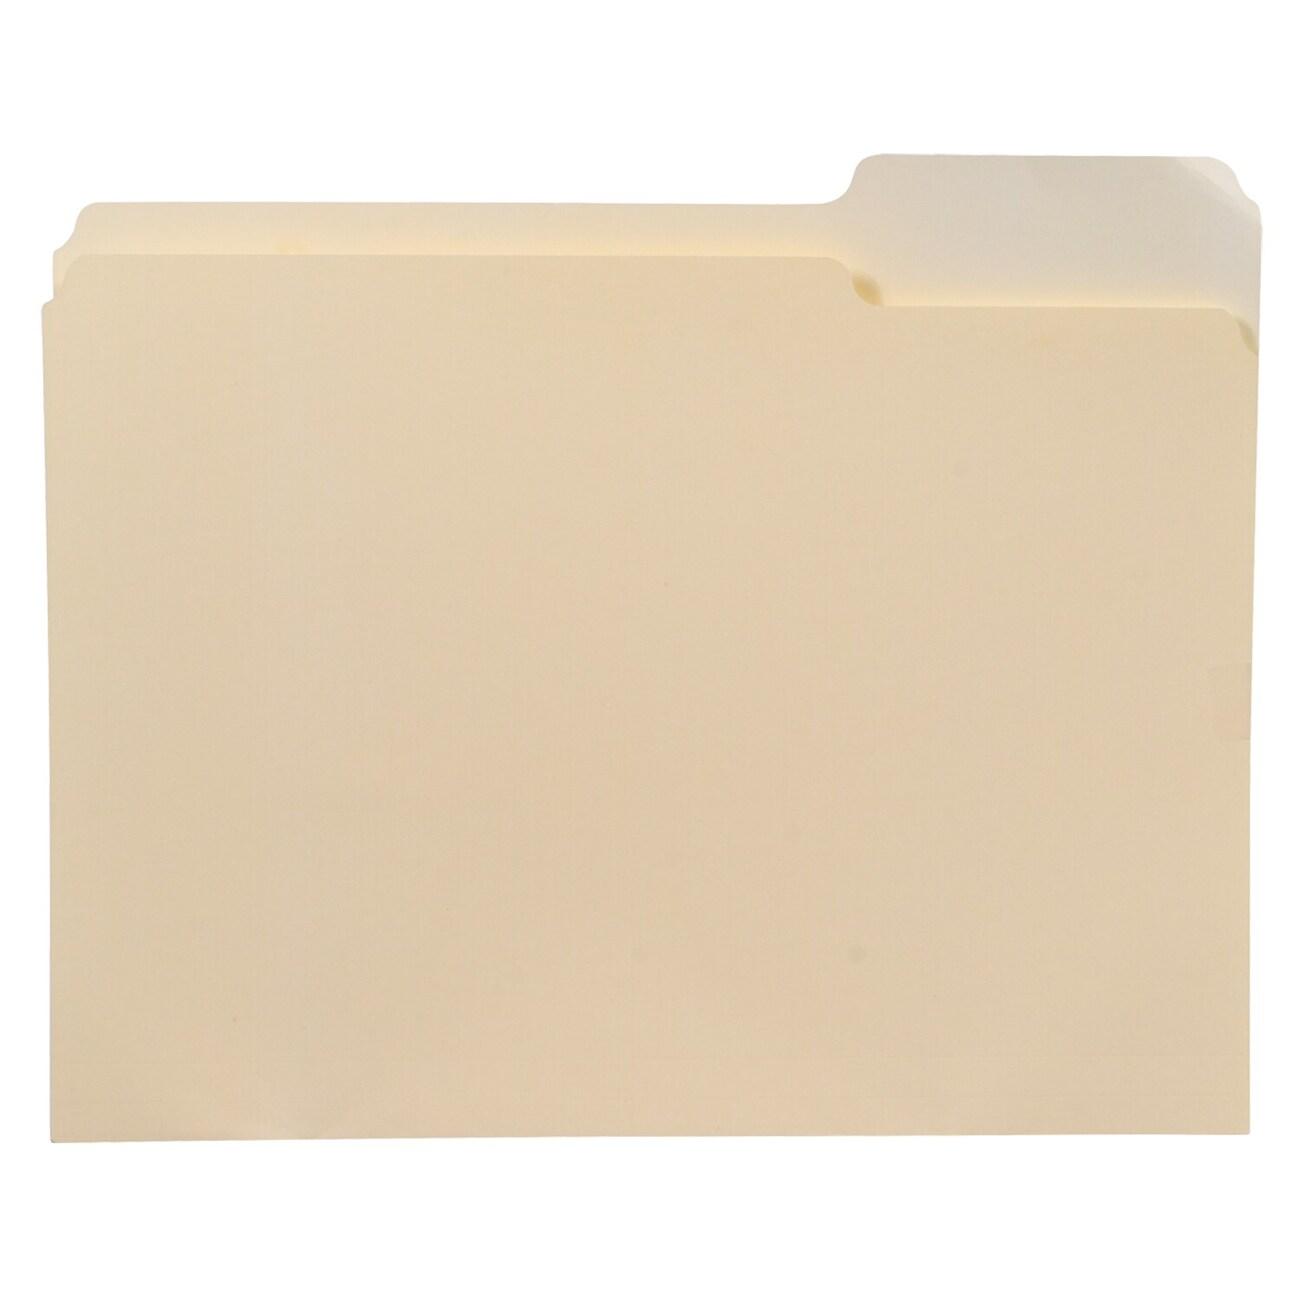 File Folders - Dollar Tree, Inc.